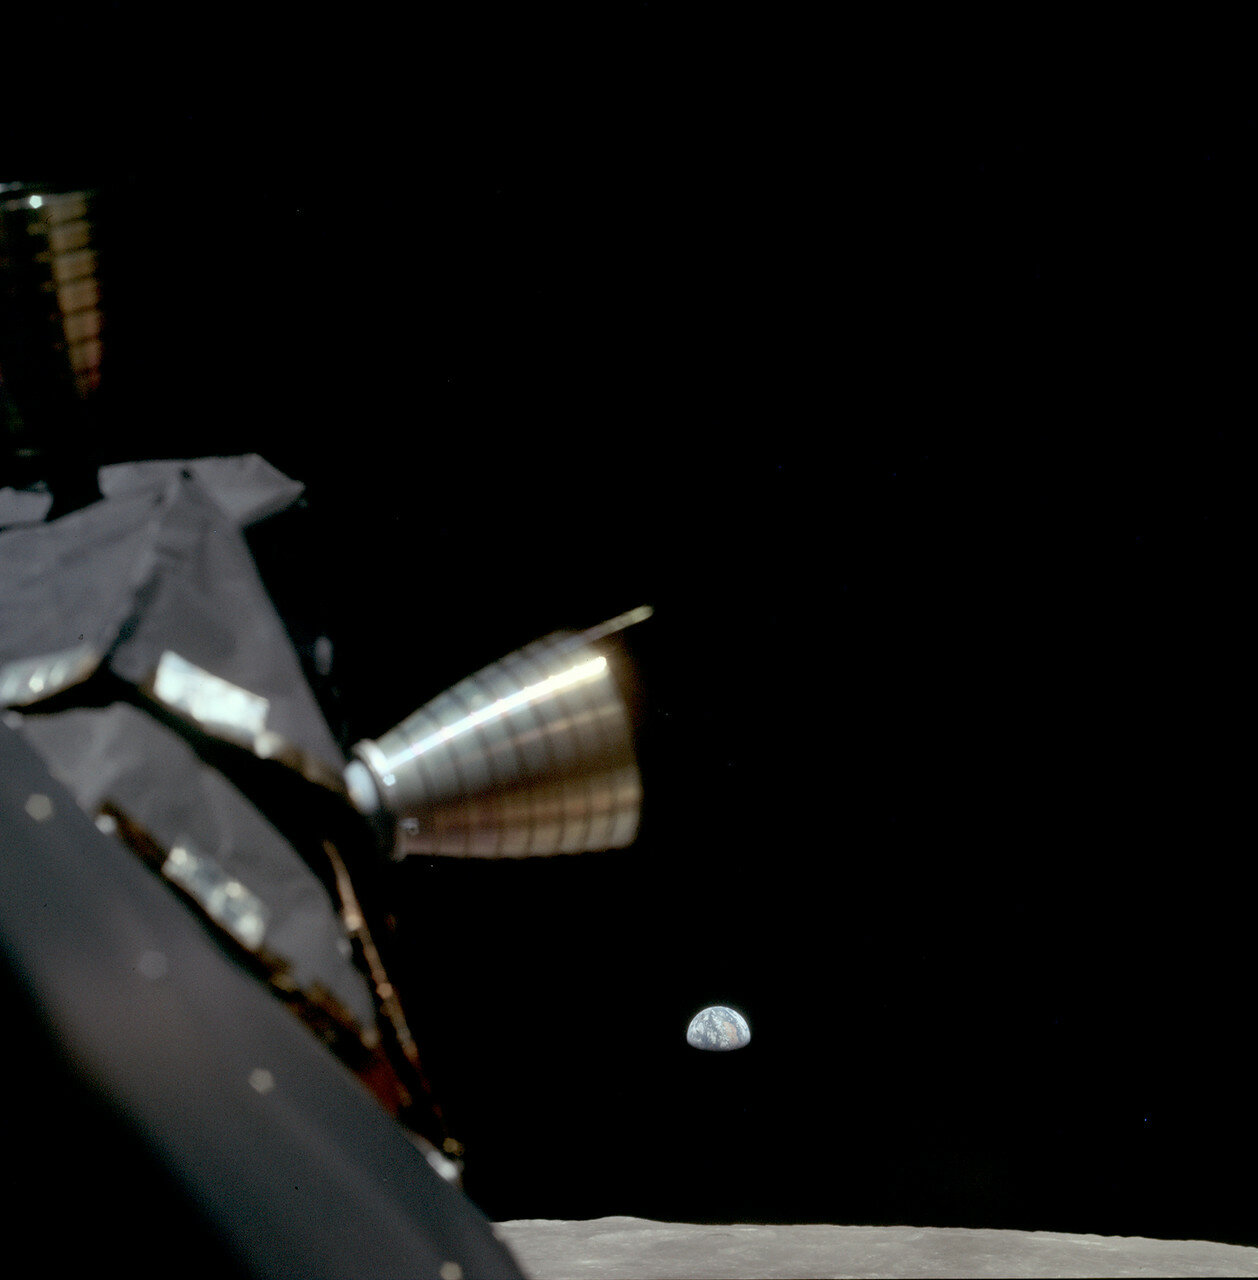 Вид Лунного модуля на фоне восходящей Земли